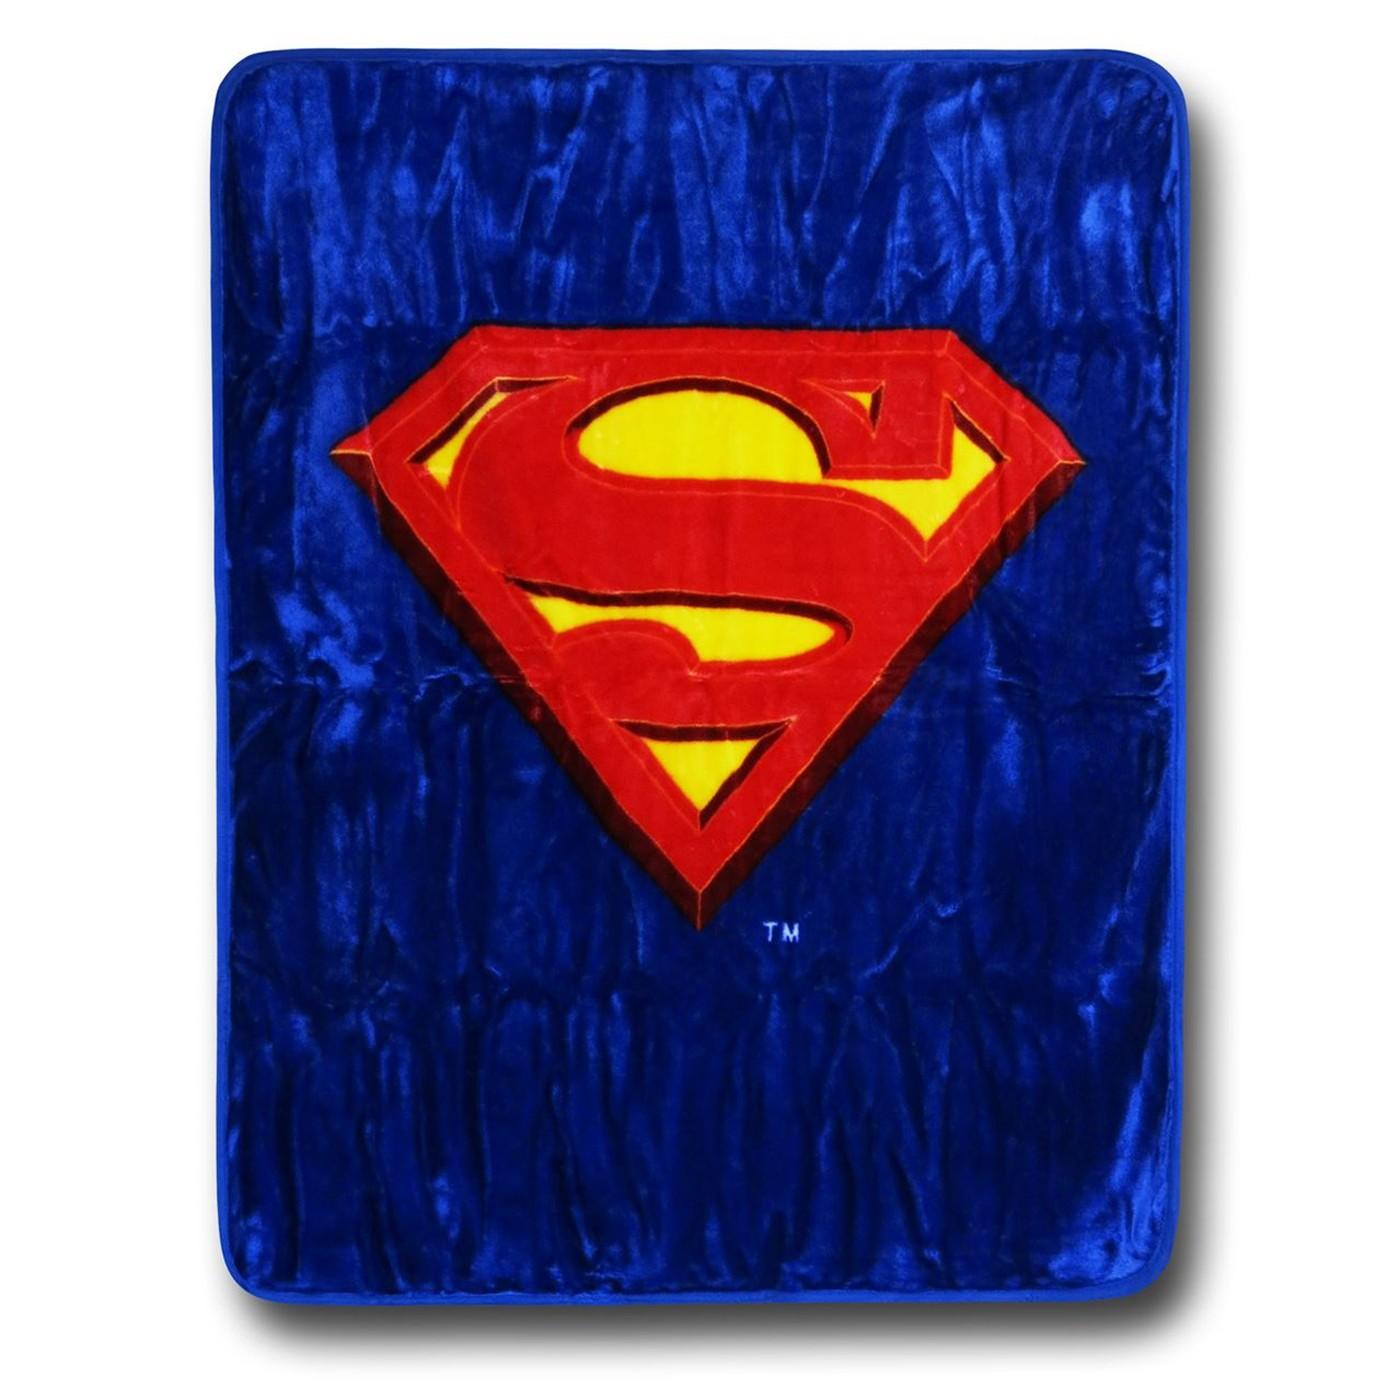 Superman Symbol Luxury Plush Blanket